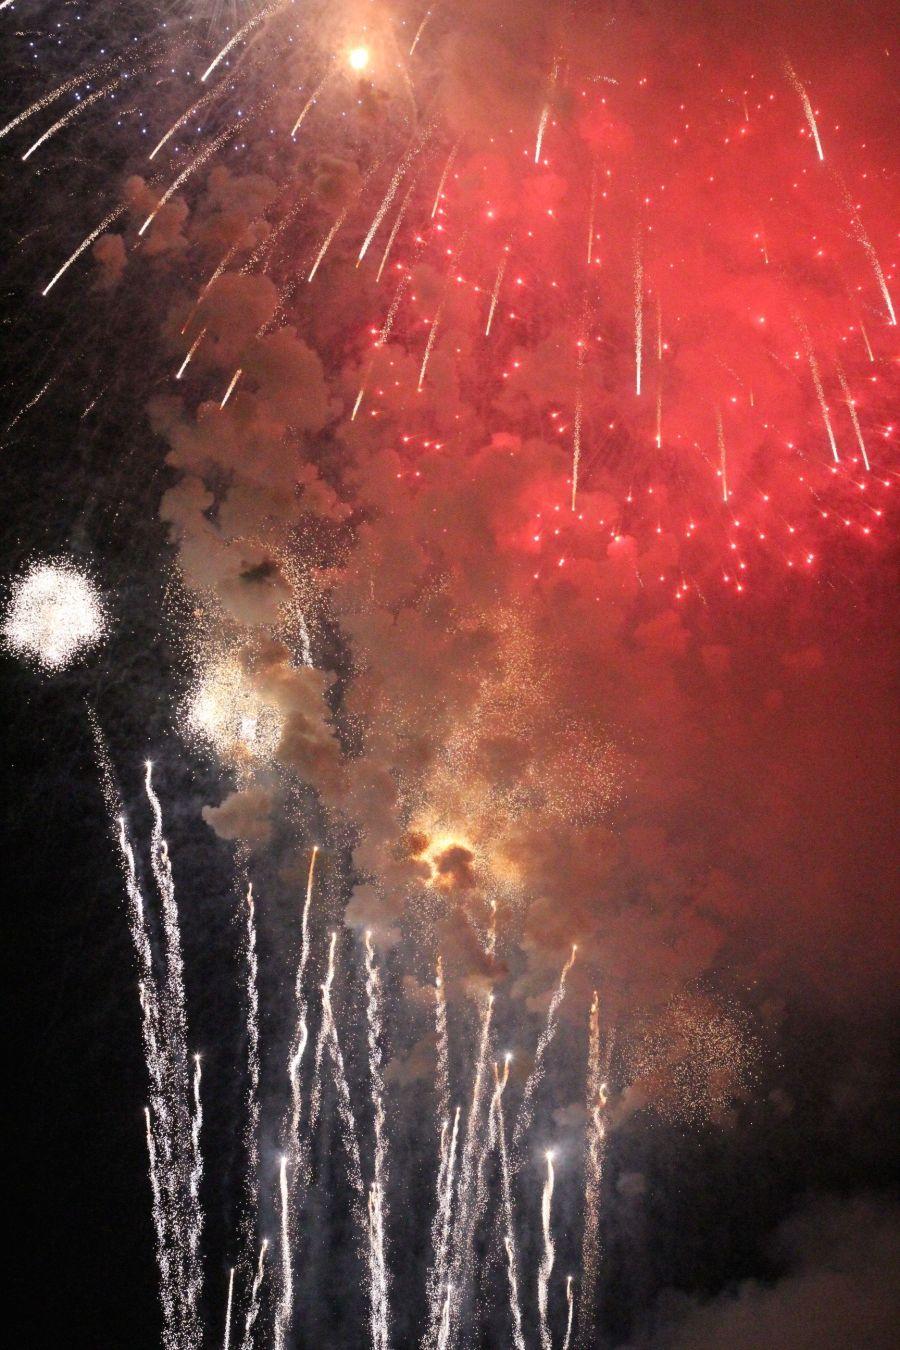 cambridge charles river fireworks 27